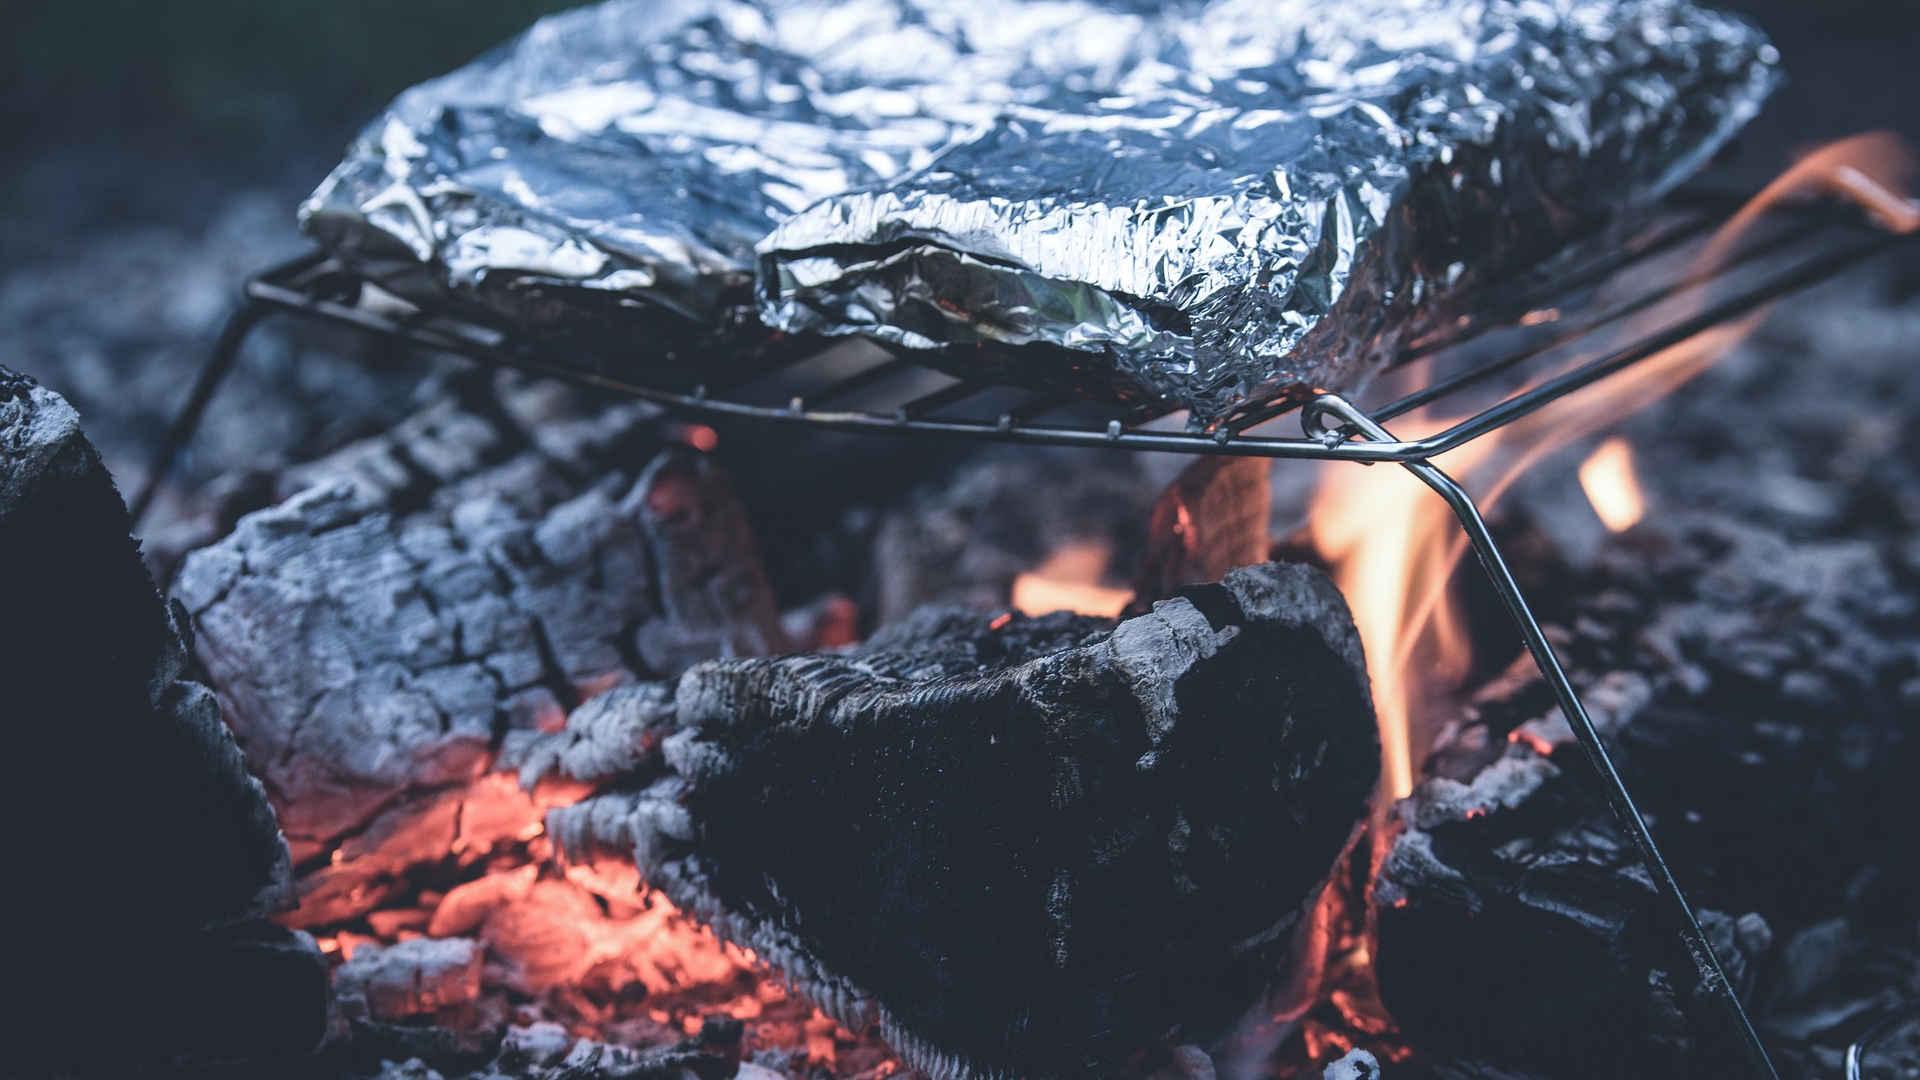 Outdoor Grill bauen: So geht's